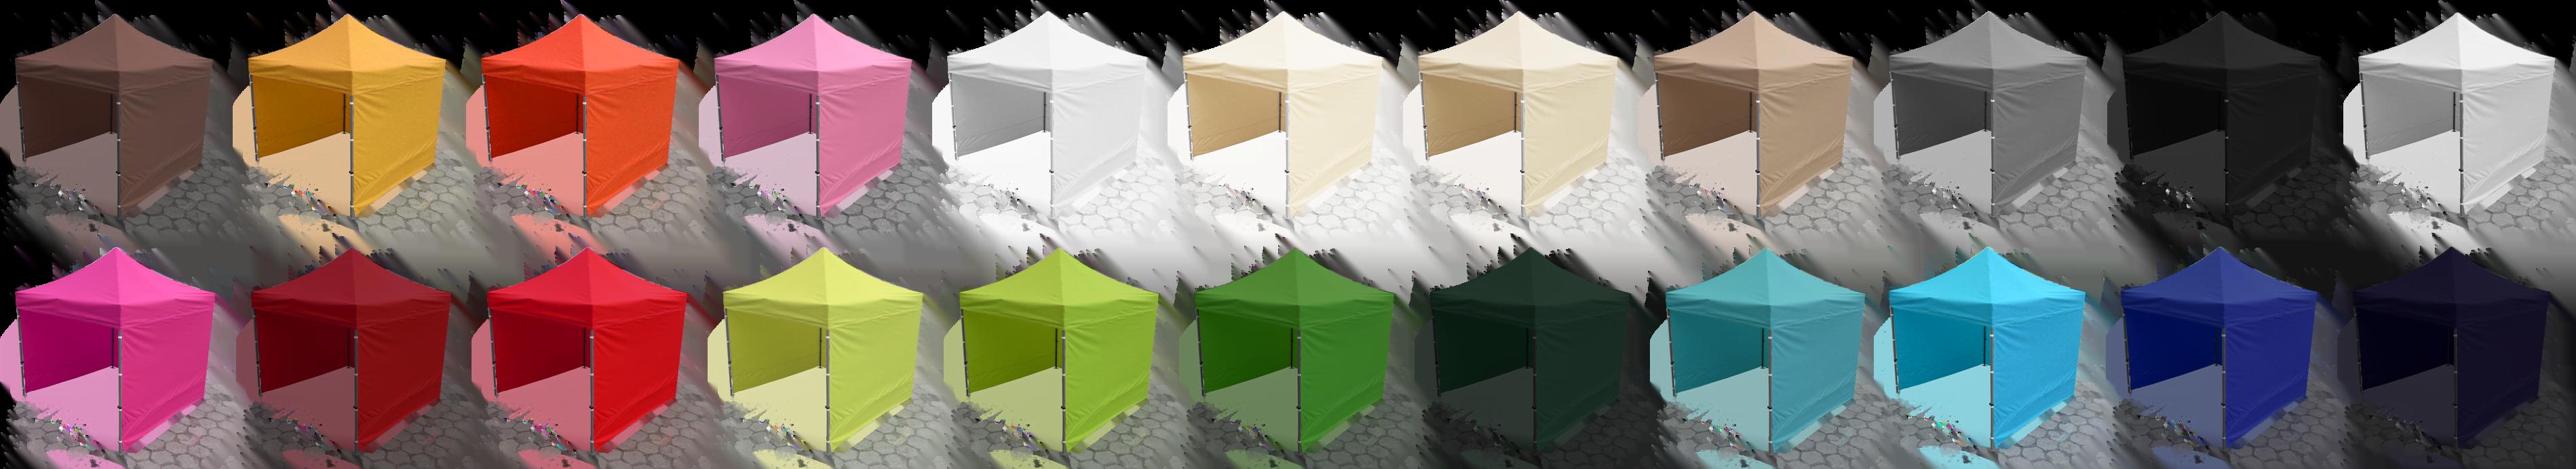 namiotykolory